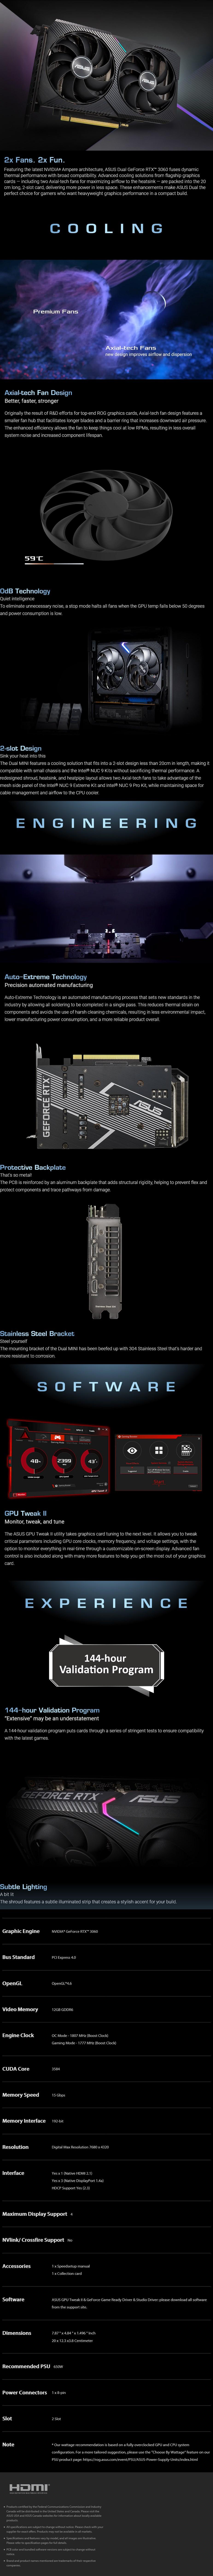 asus-geforce-rtx-3060-dual-12gb-video-card-ac43074-11.jpg